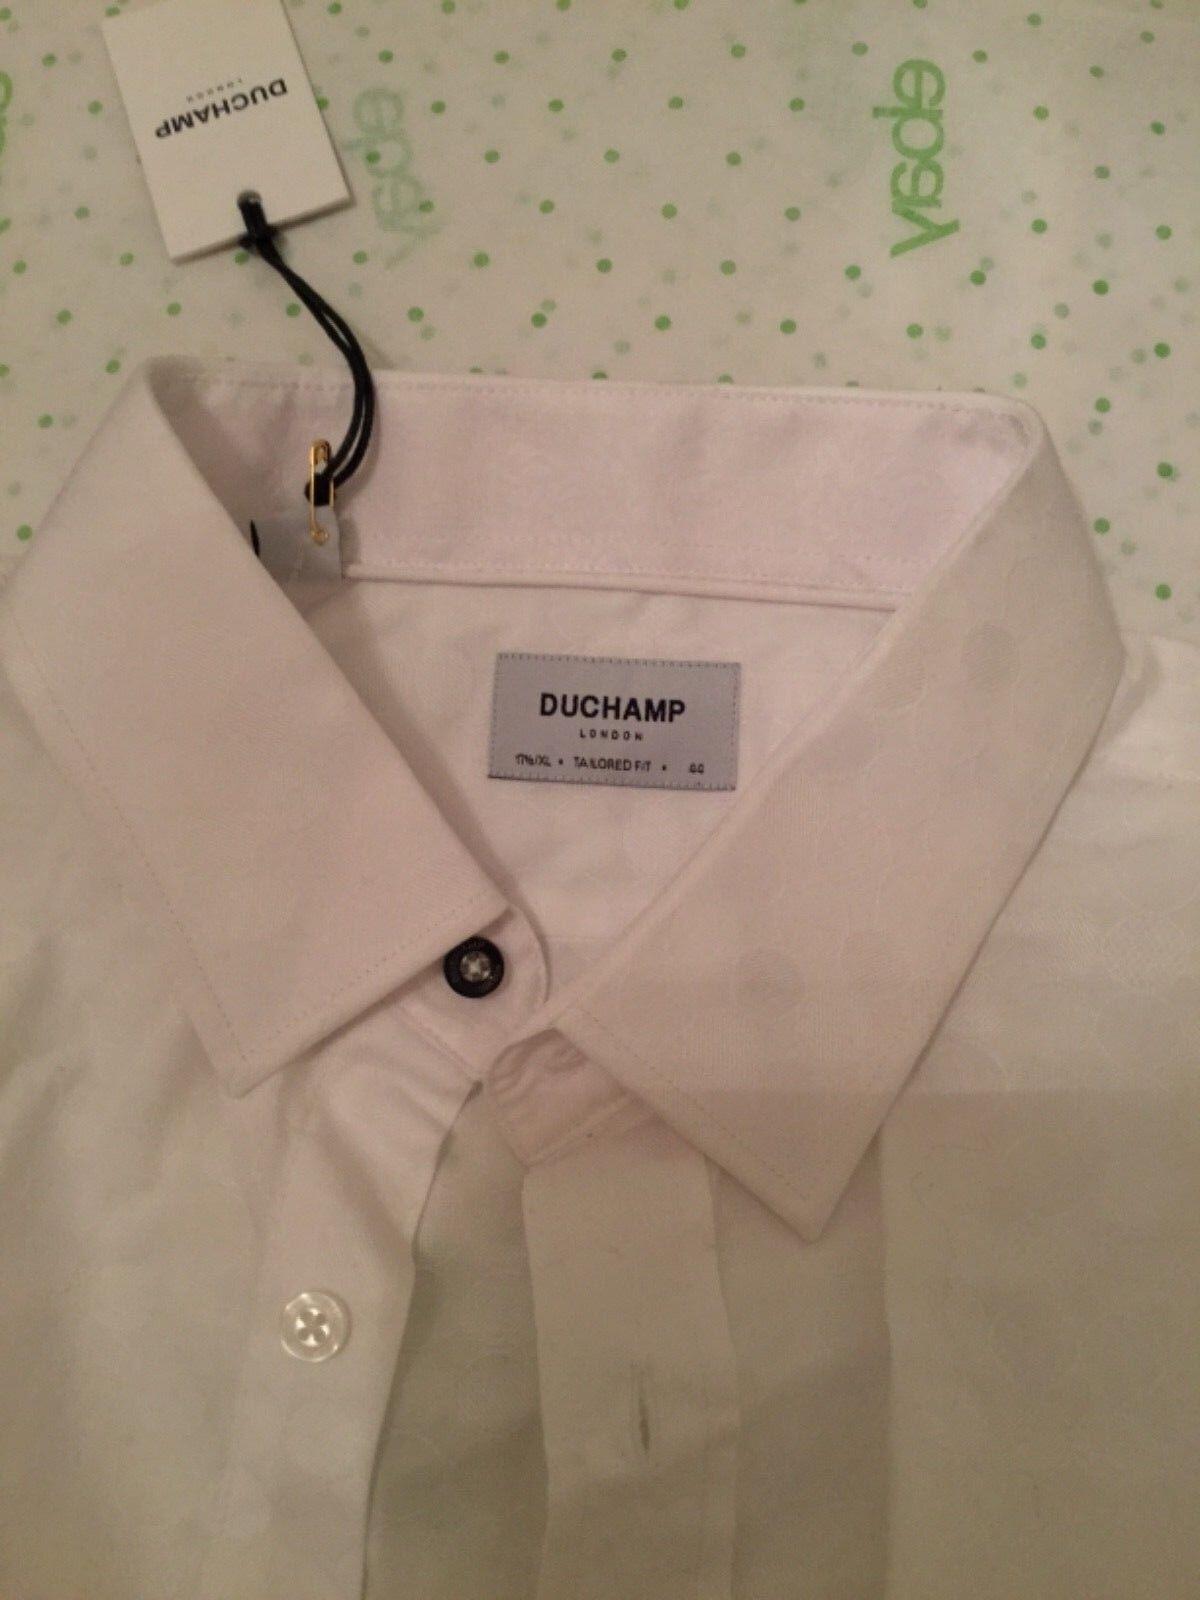 NEW Duchamp London Men's TailoROT Fit Weiß Patterned Dress Shirt - 17.5 / XL